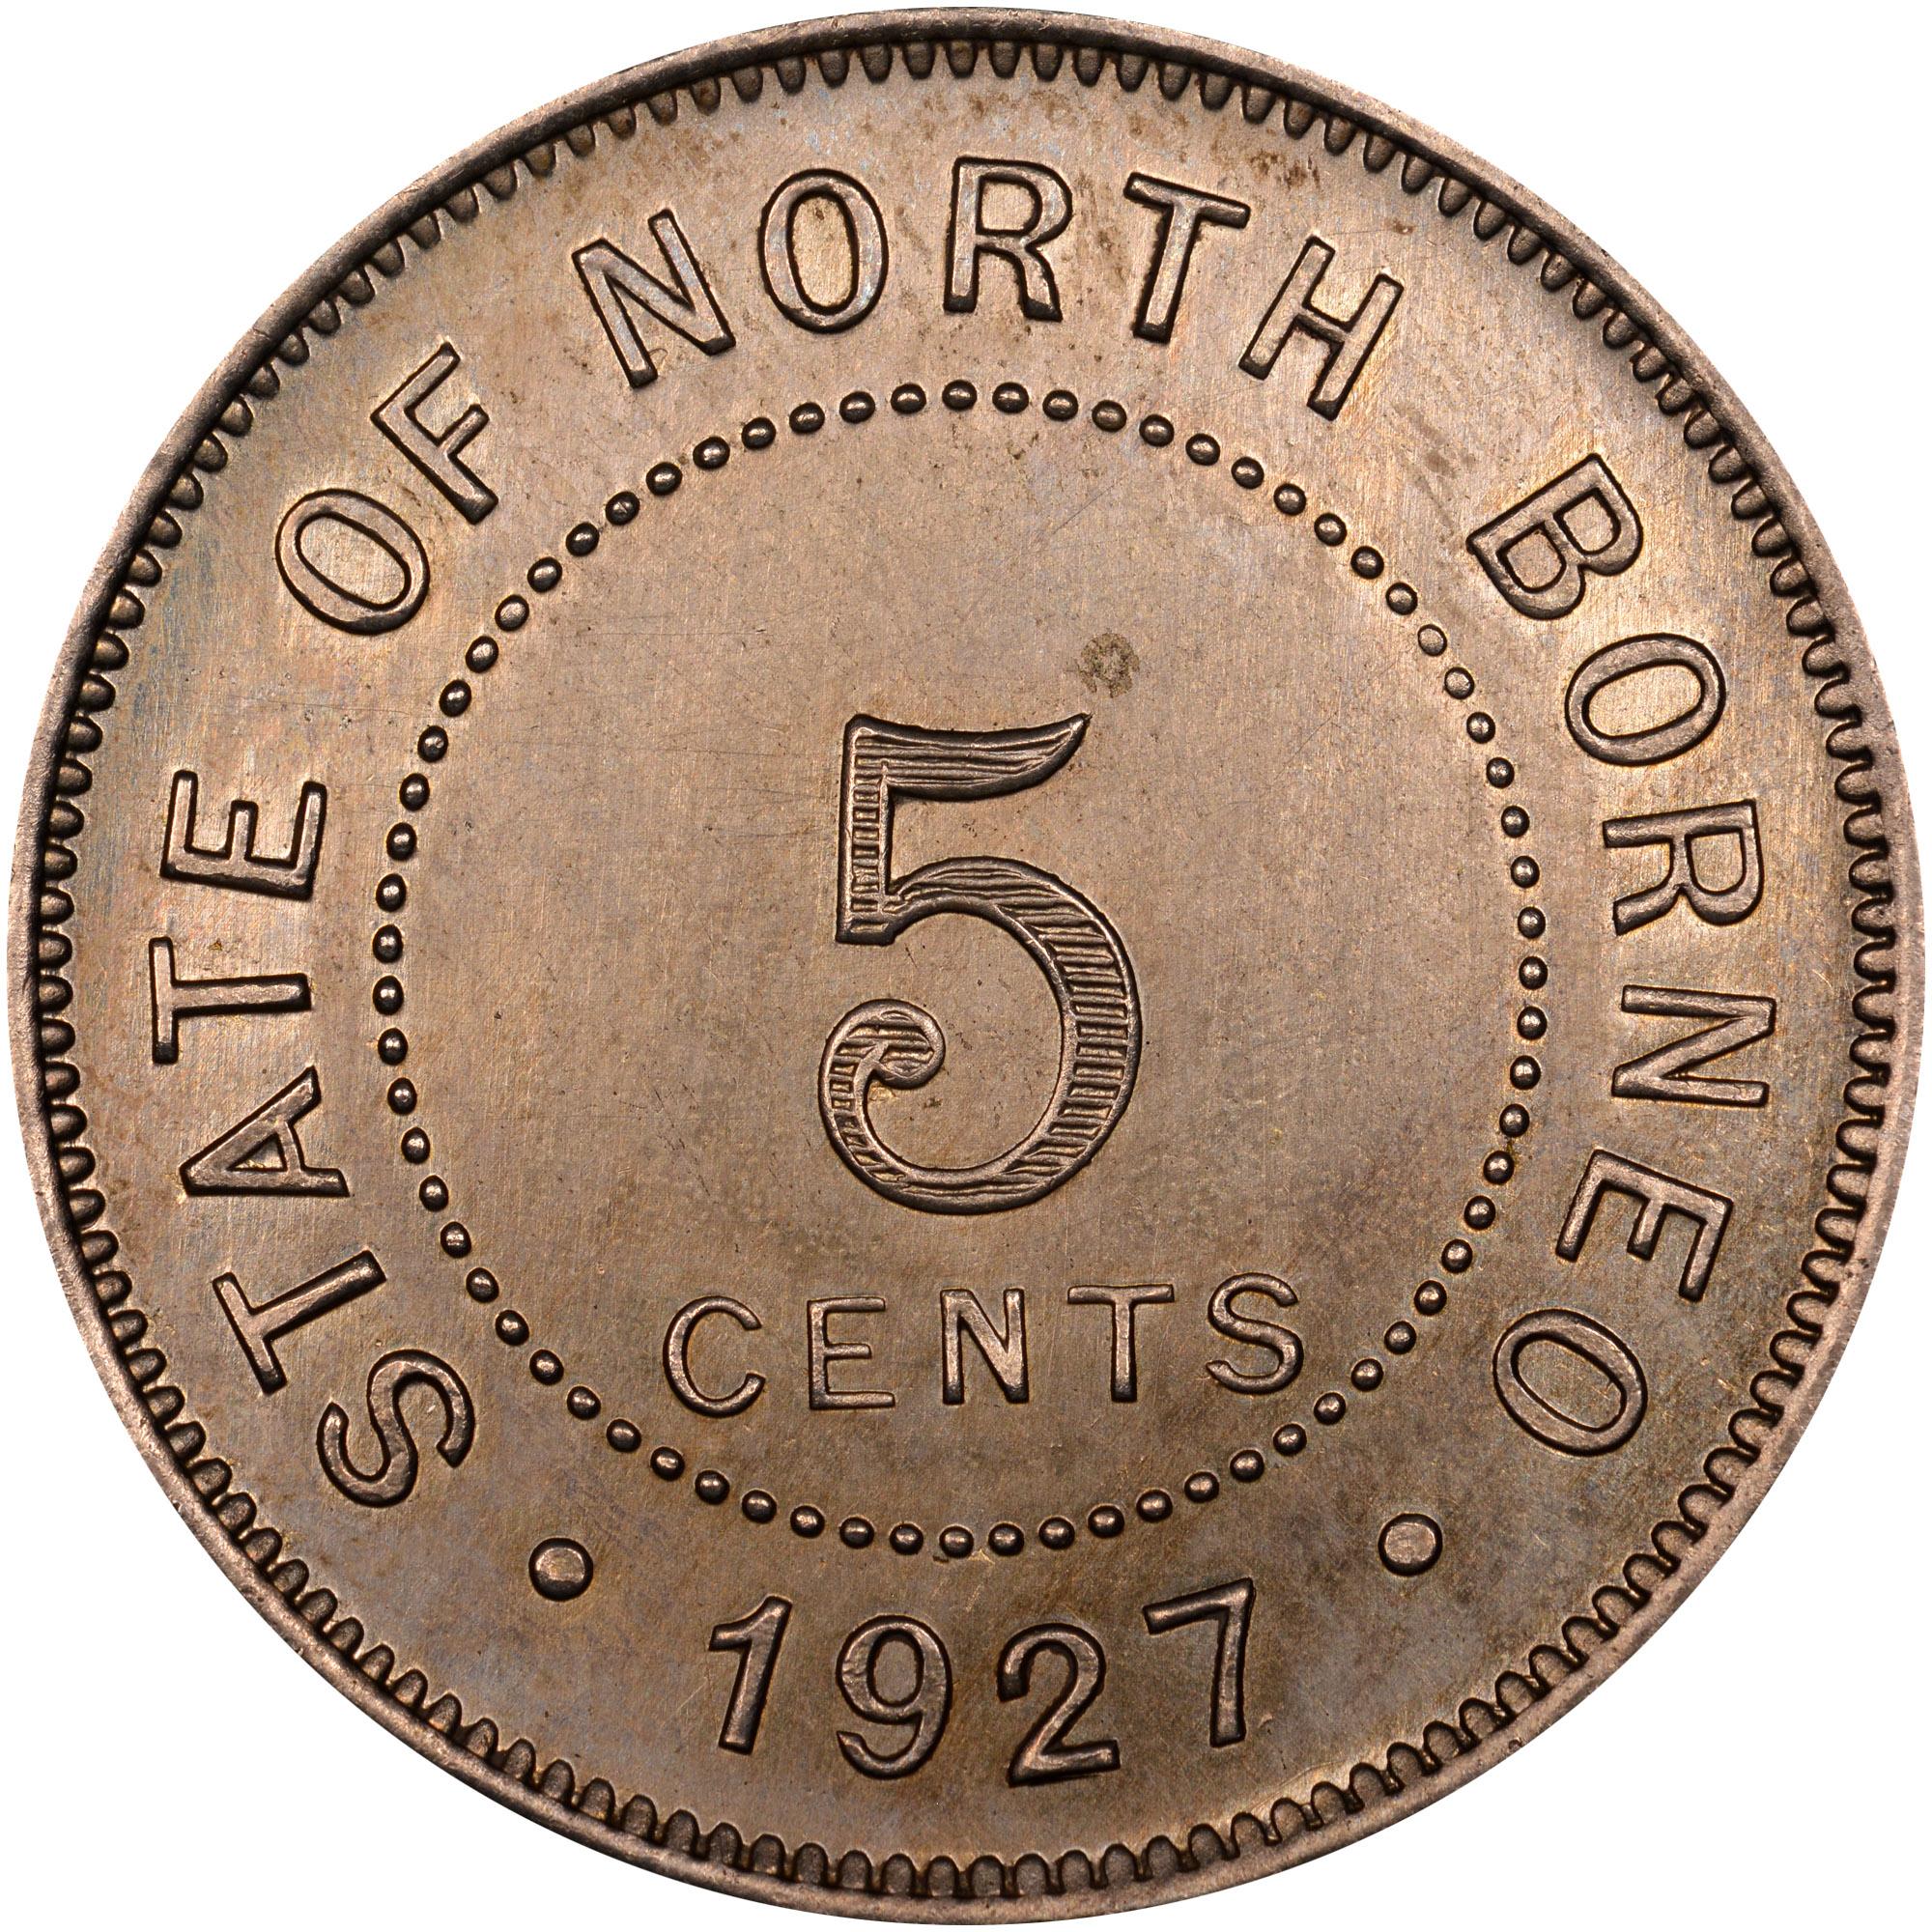 1903-1941 British North Borneo 5 Cents obverse